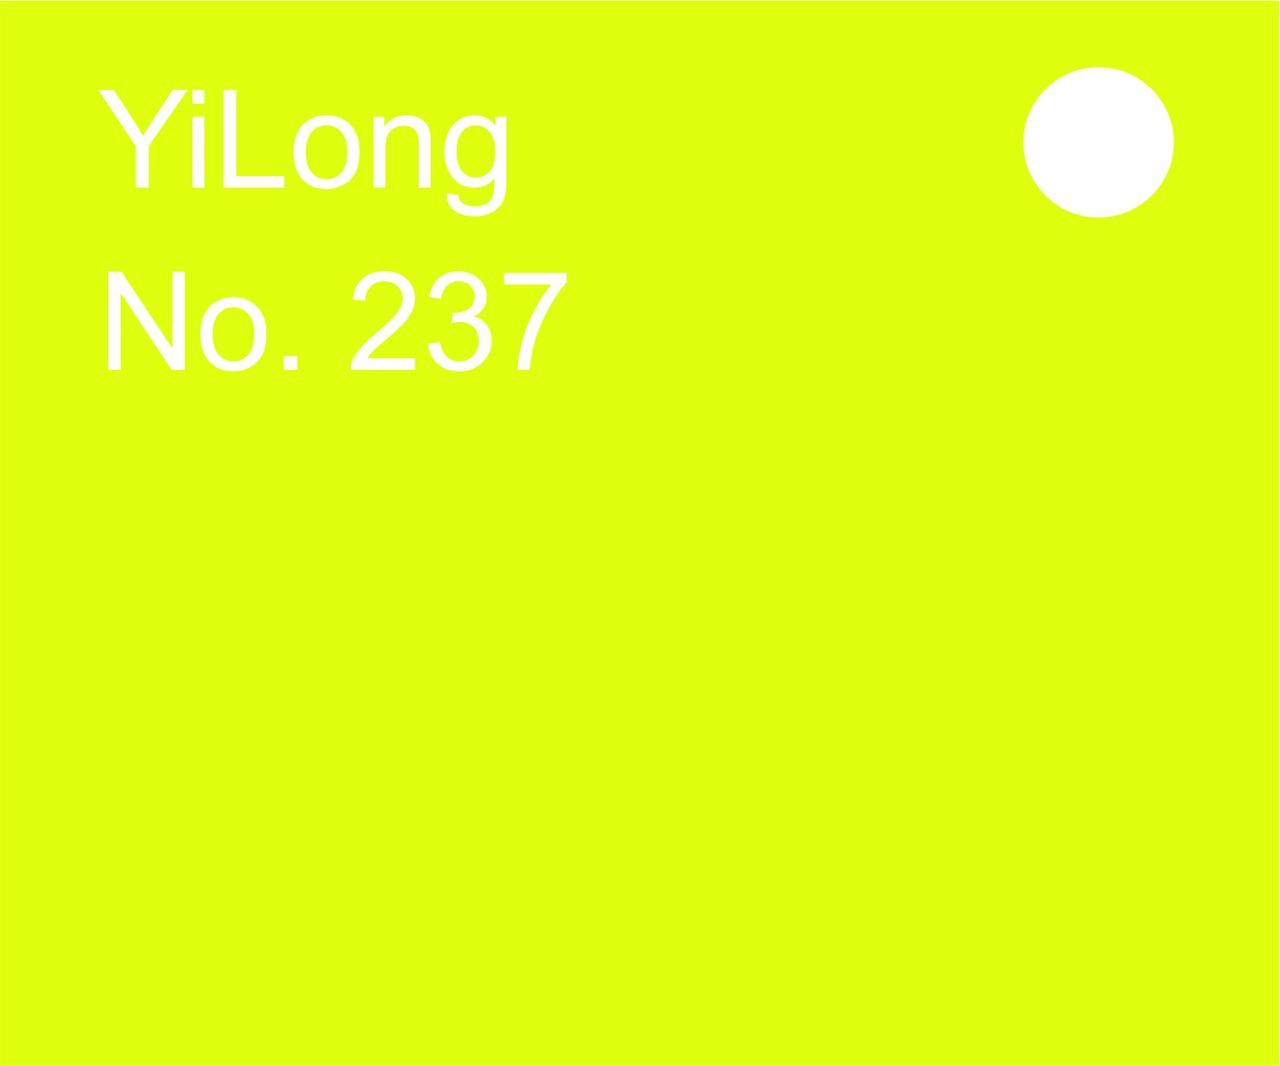 Акрил желтый светлый 3мм (1,25м х 2,48м)